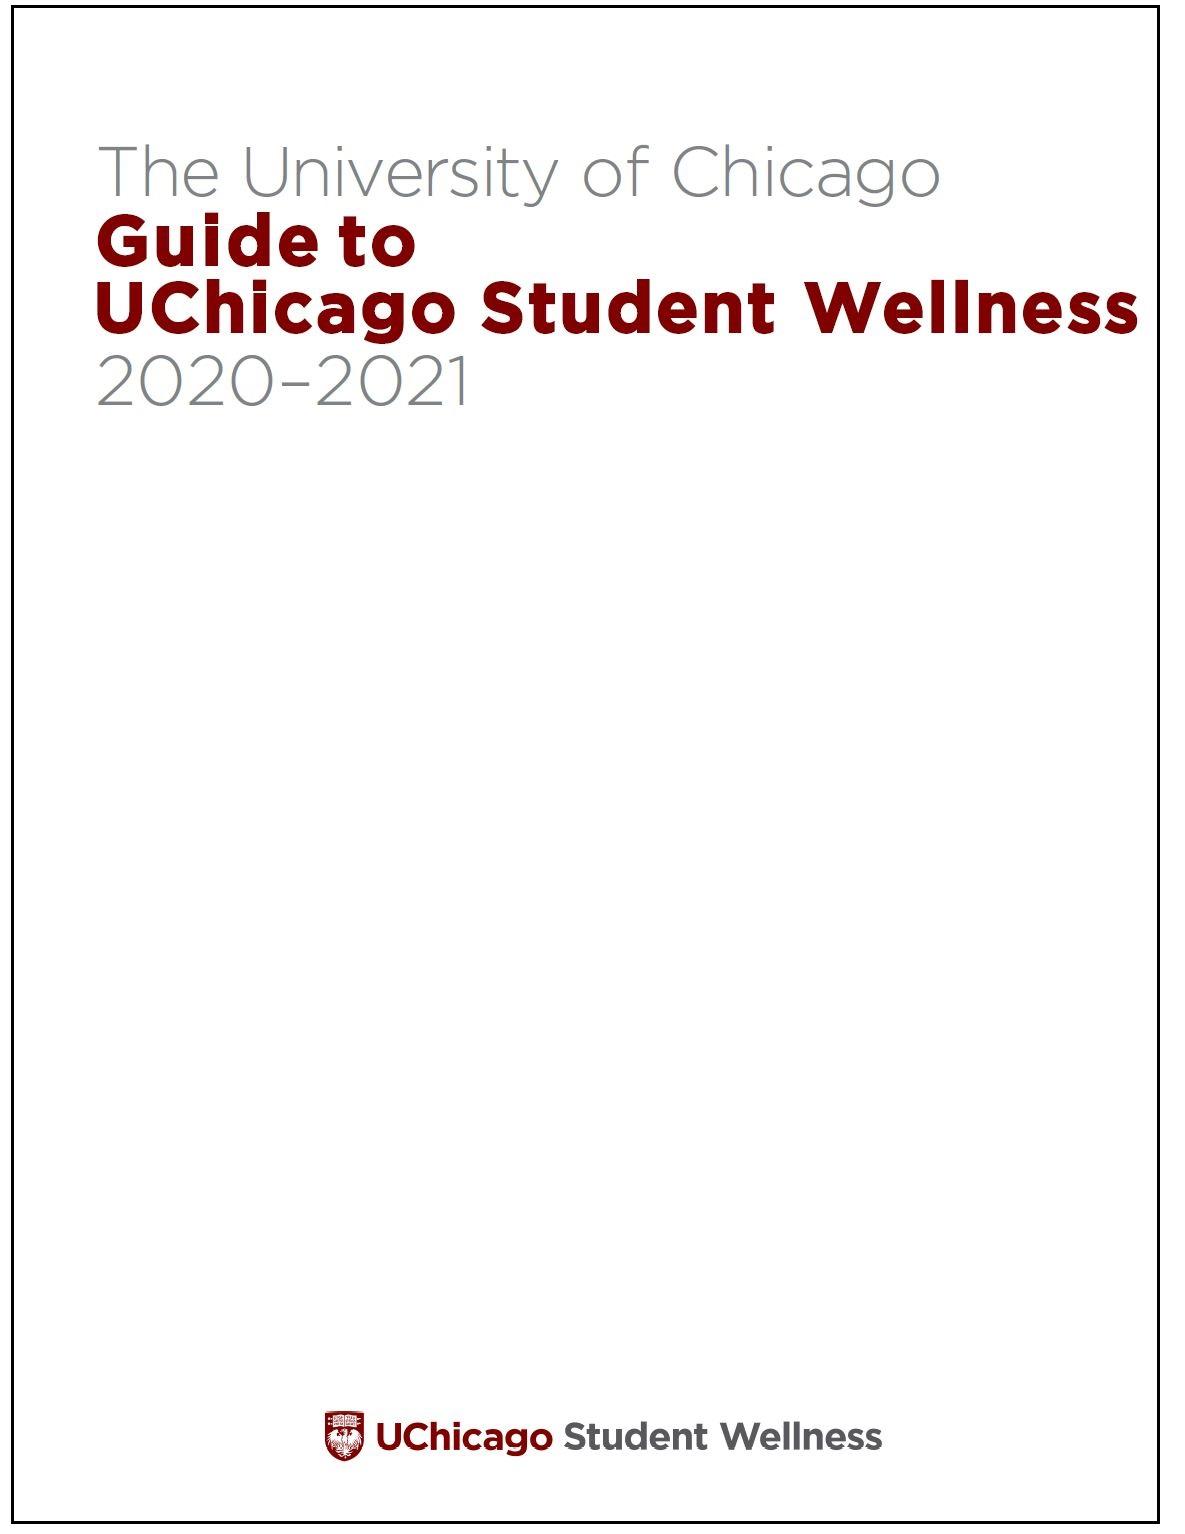 Guide to UChicago Student Wellness